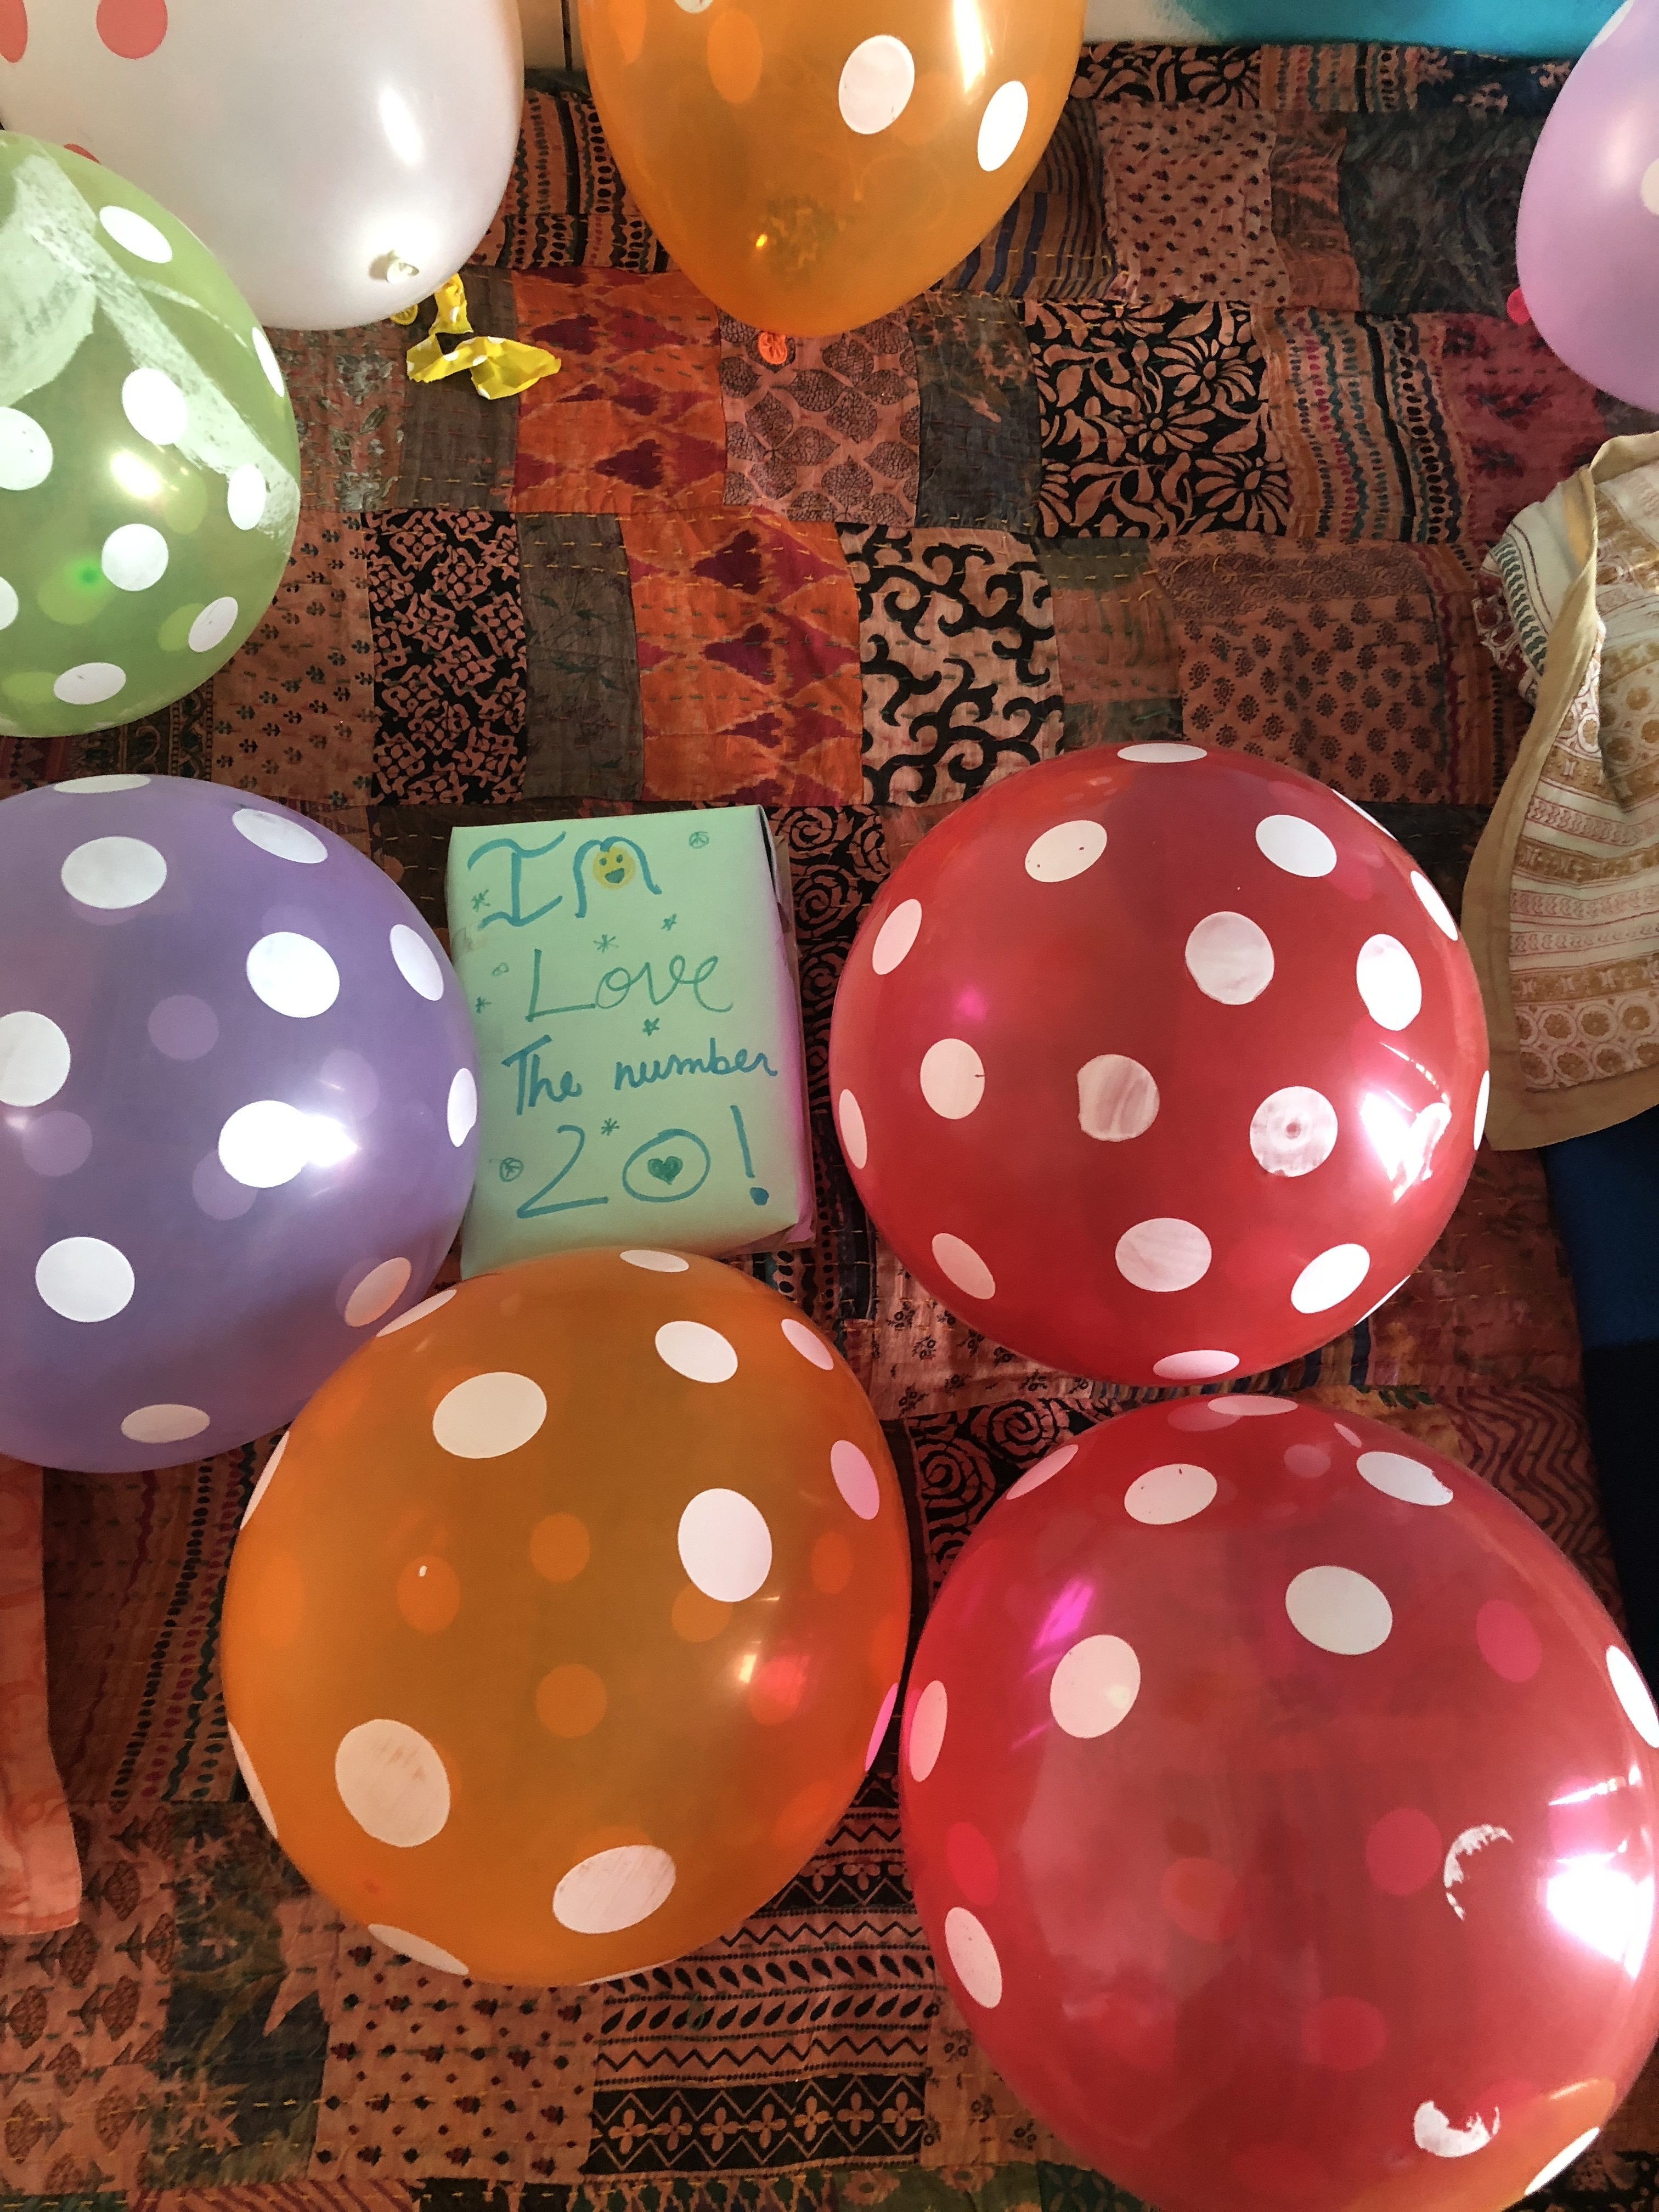 gratitude-circle-natasha-musing-seven-things-i-m-grateful-for-in-june-balloons